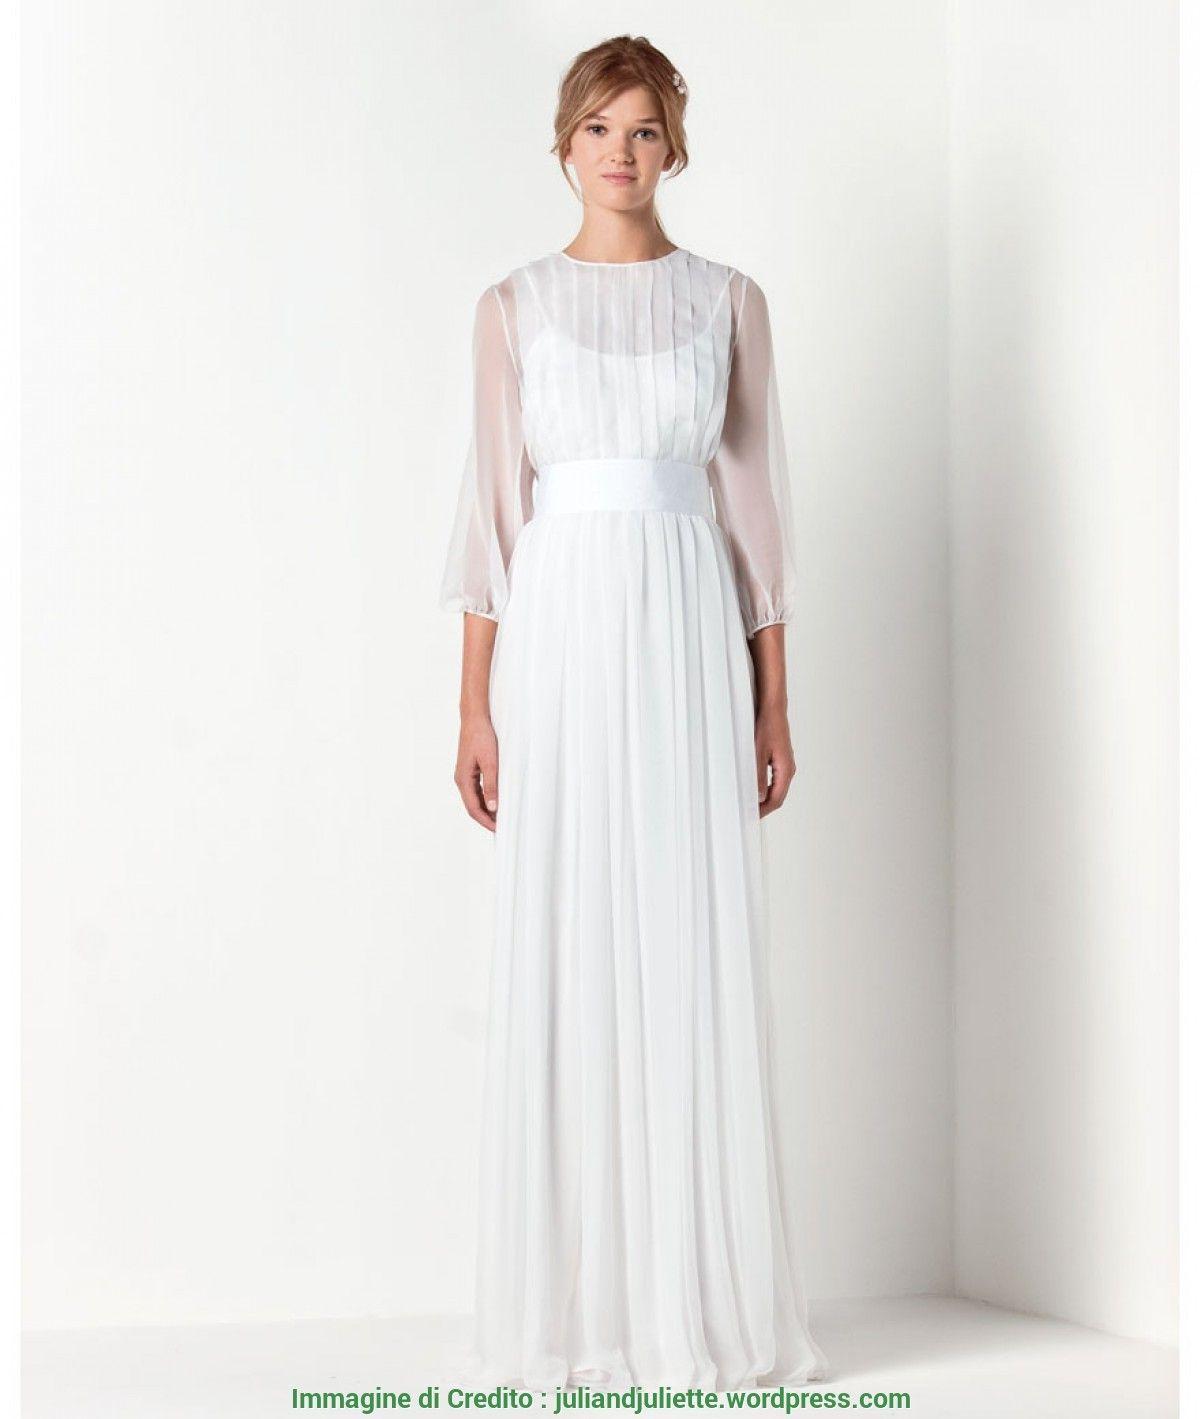 Uhm simple lovely and elegant wedding dress designer